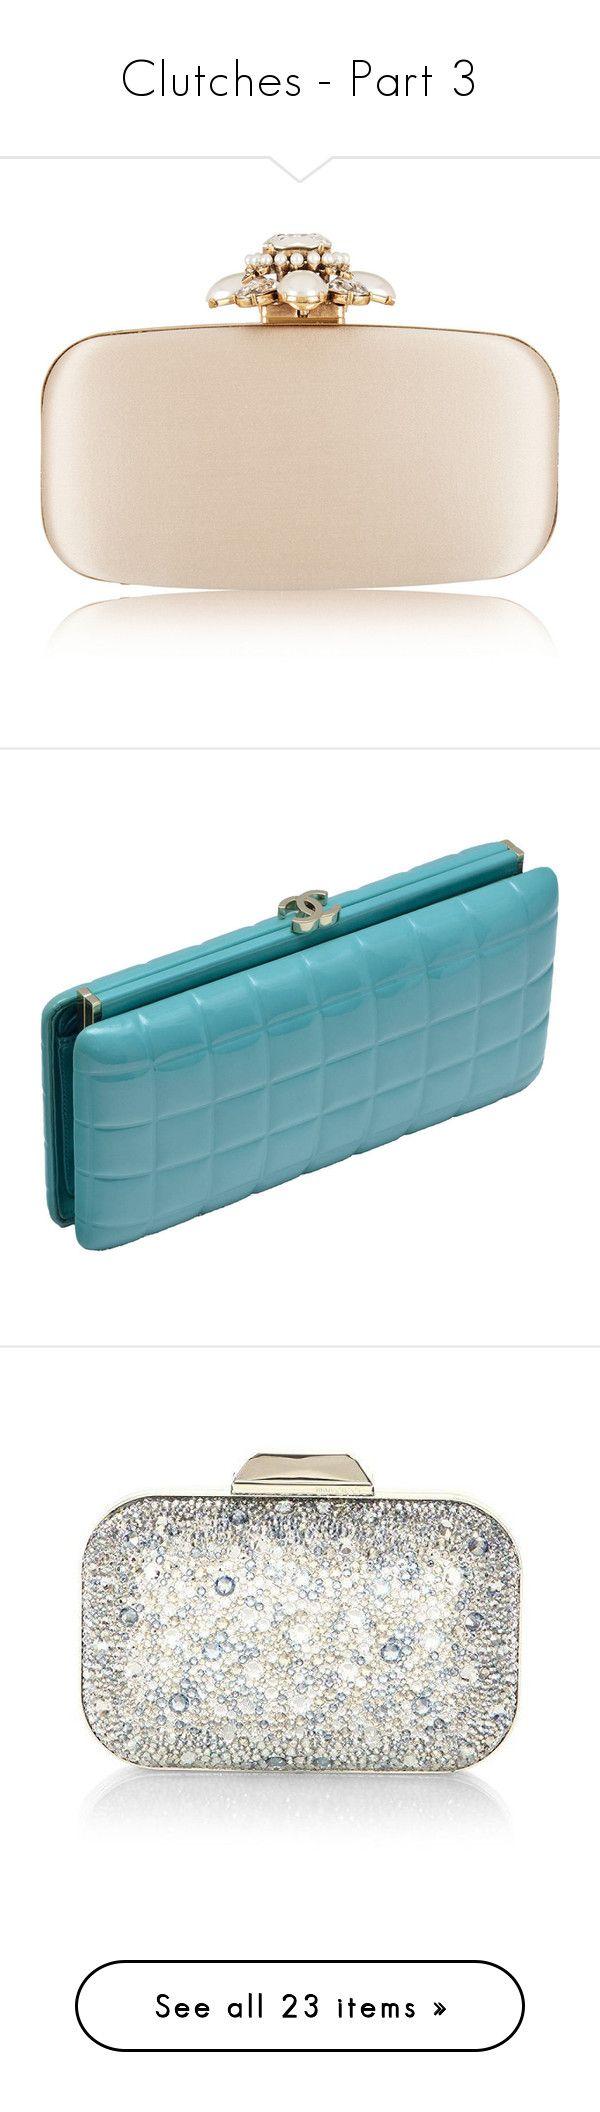 """Clutches - Part 3"" by miriam83 ❤ liked on Polyvore featuring bags, handbags, clutches, bolsas, oscar de la renta, neutrals, box clutch, satin clutches, chain handle handbags and pink purse"